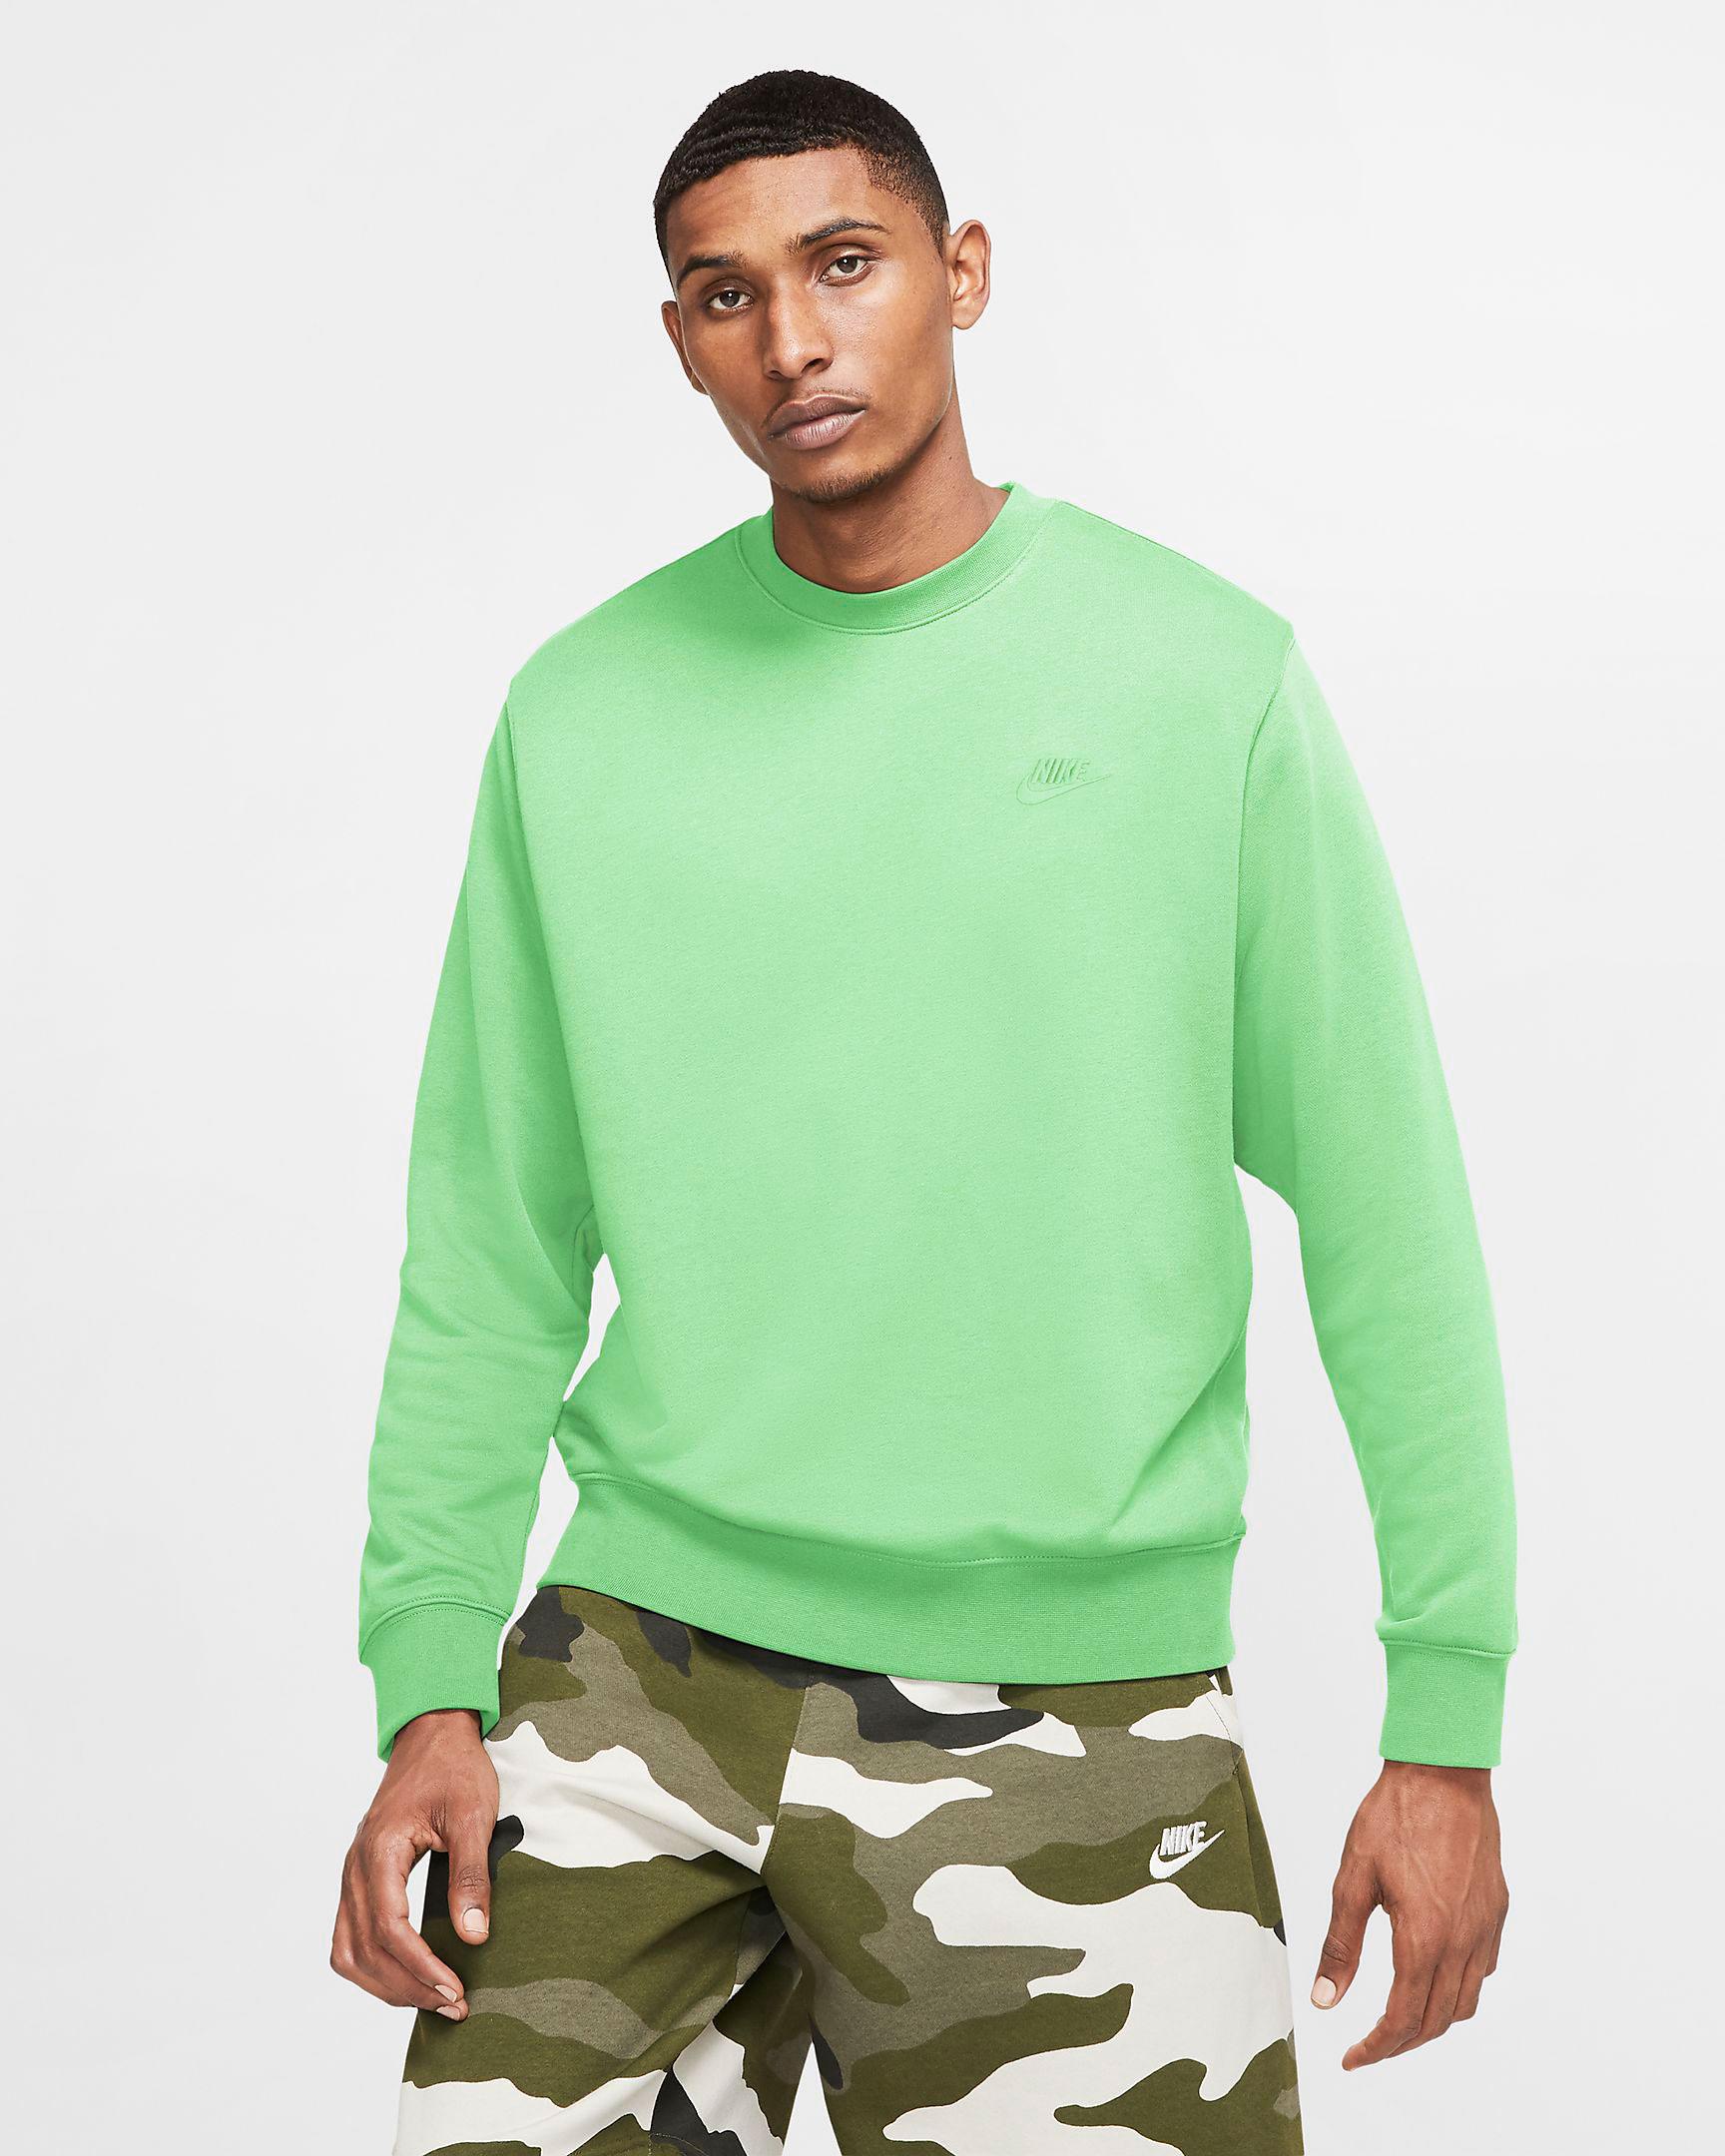 nike-pg-4-gatorade-white-gx-sweatshirt-match